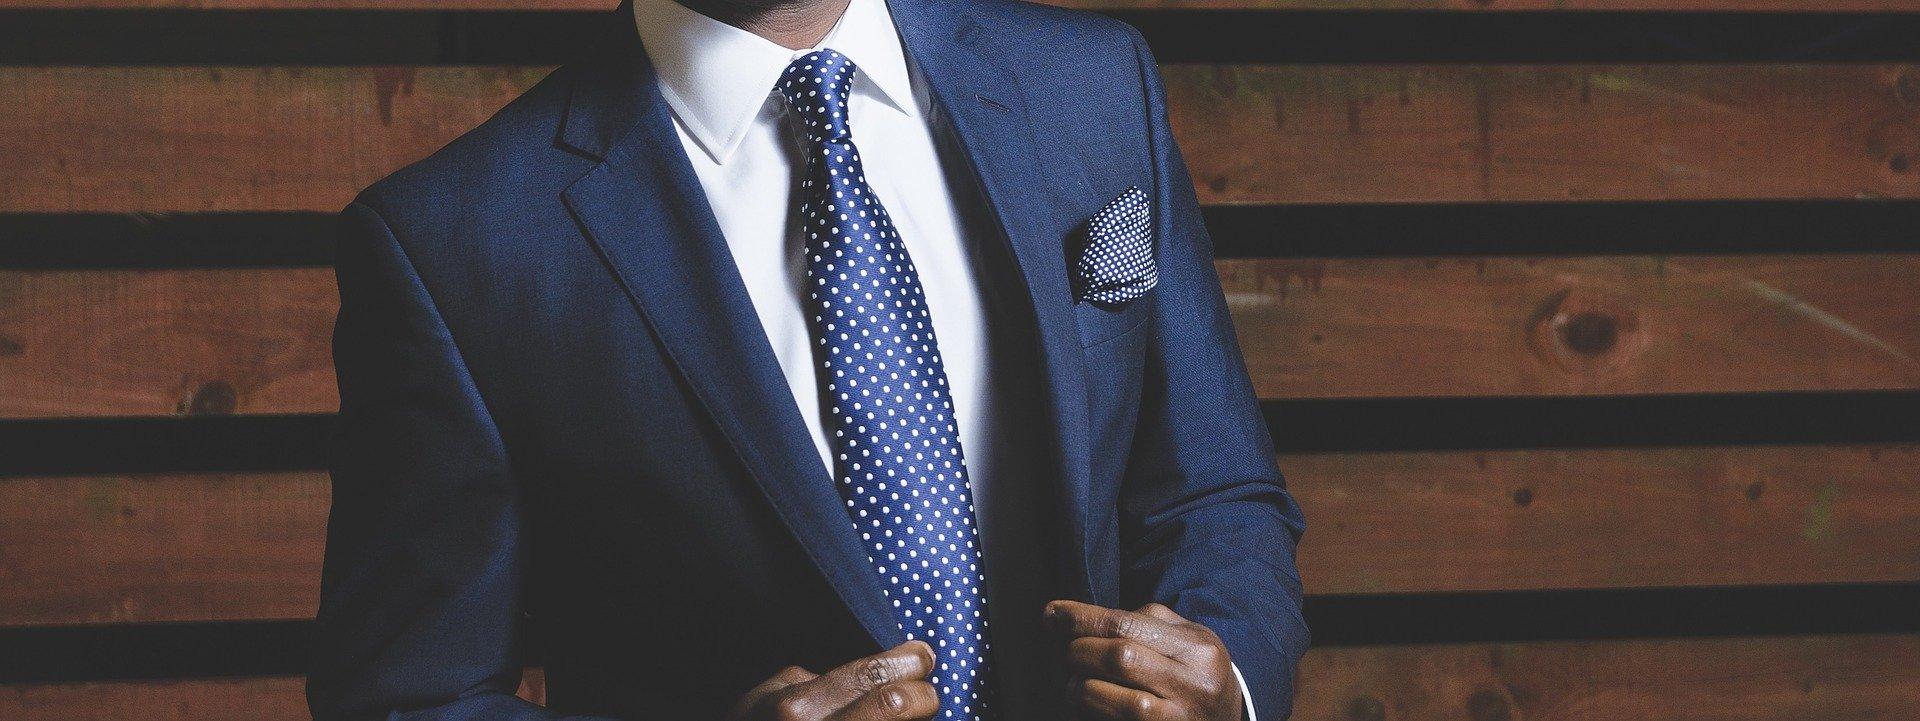 Finance Director in suit